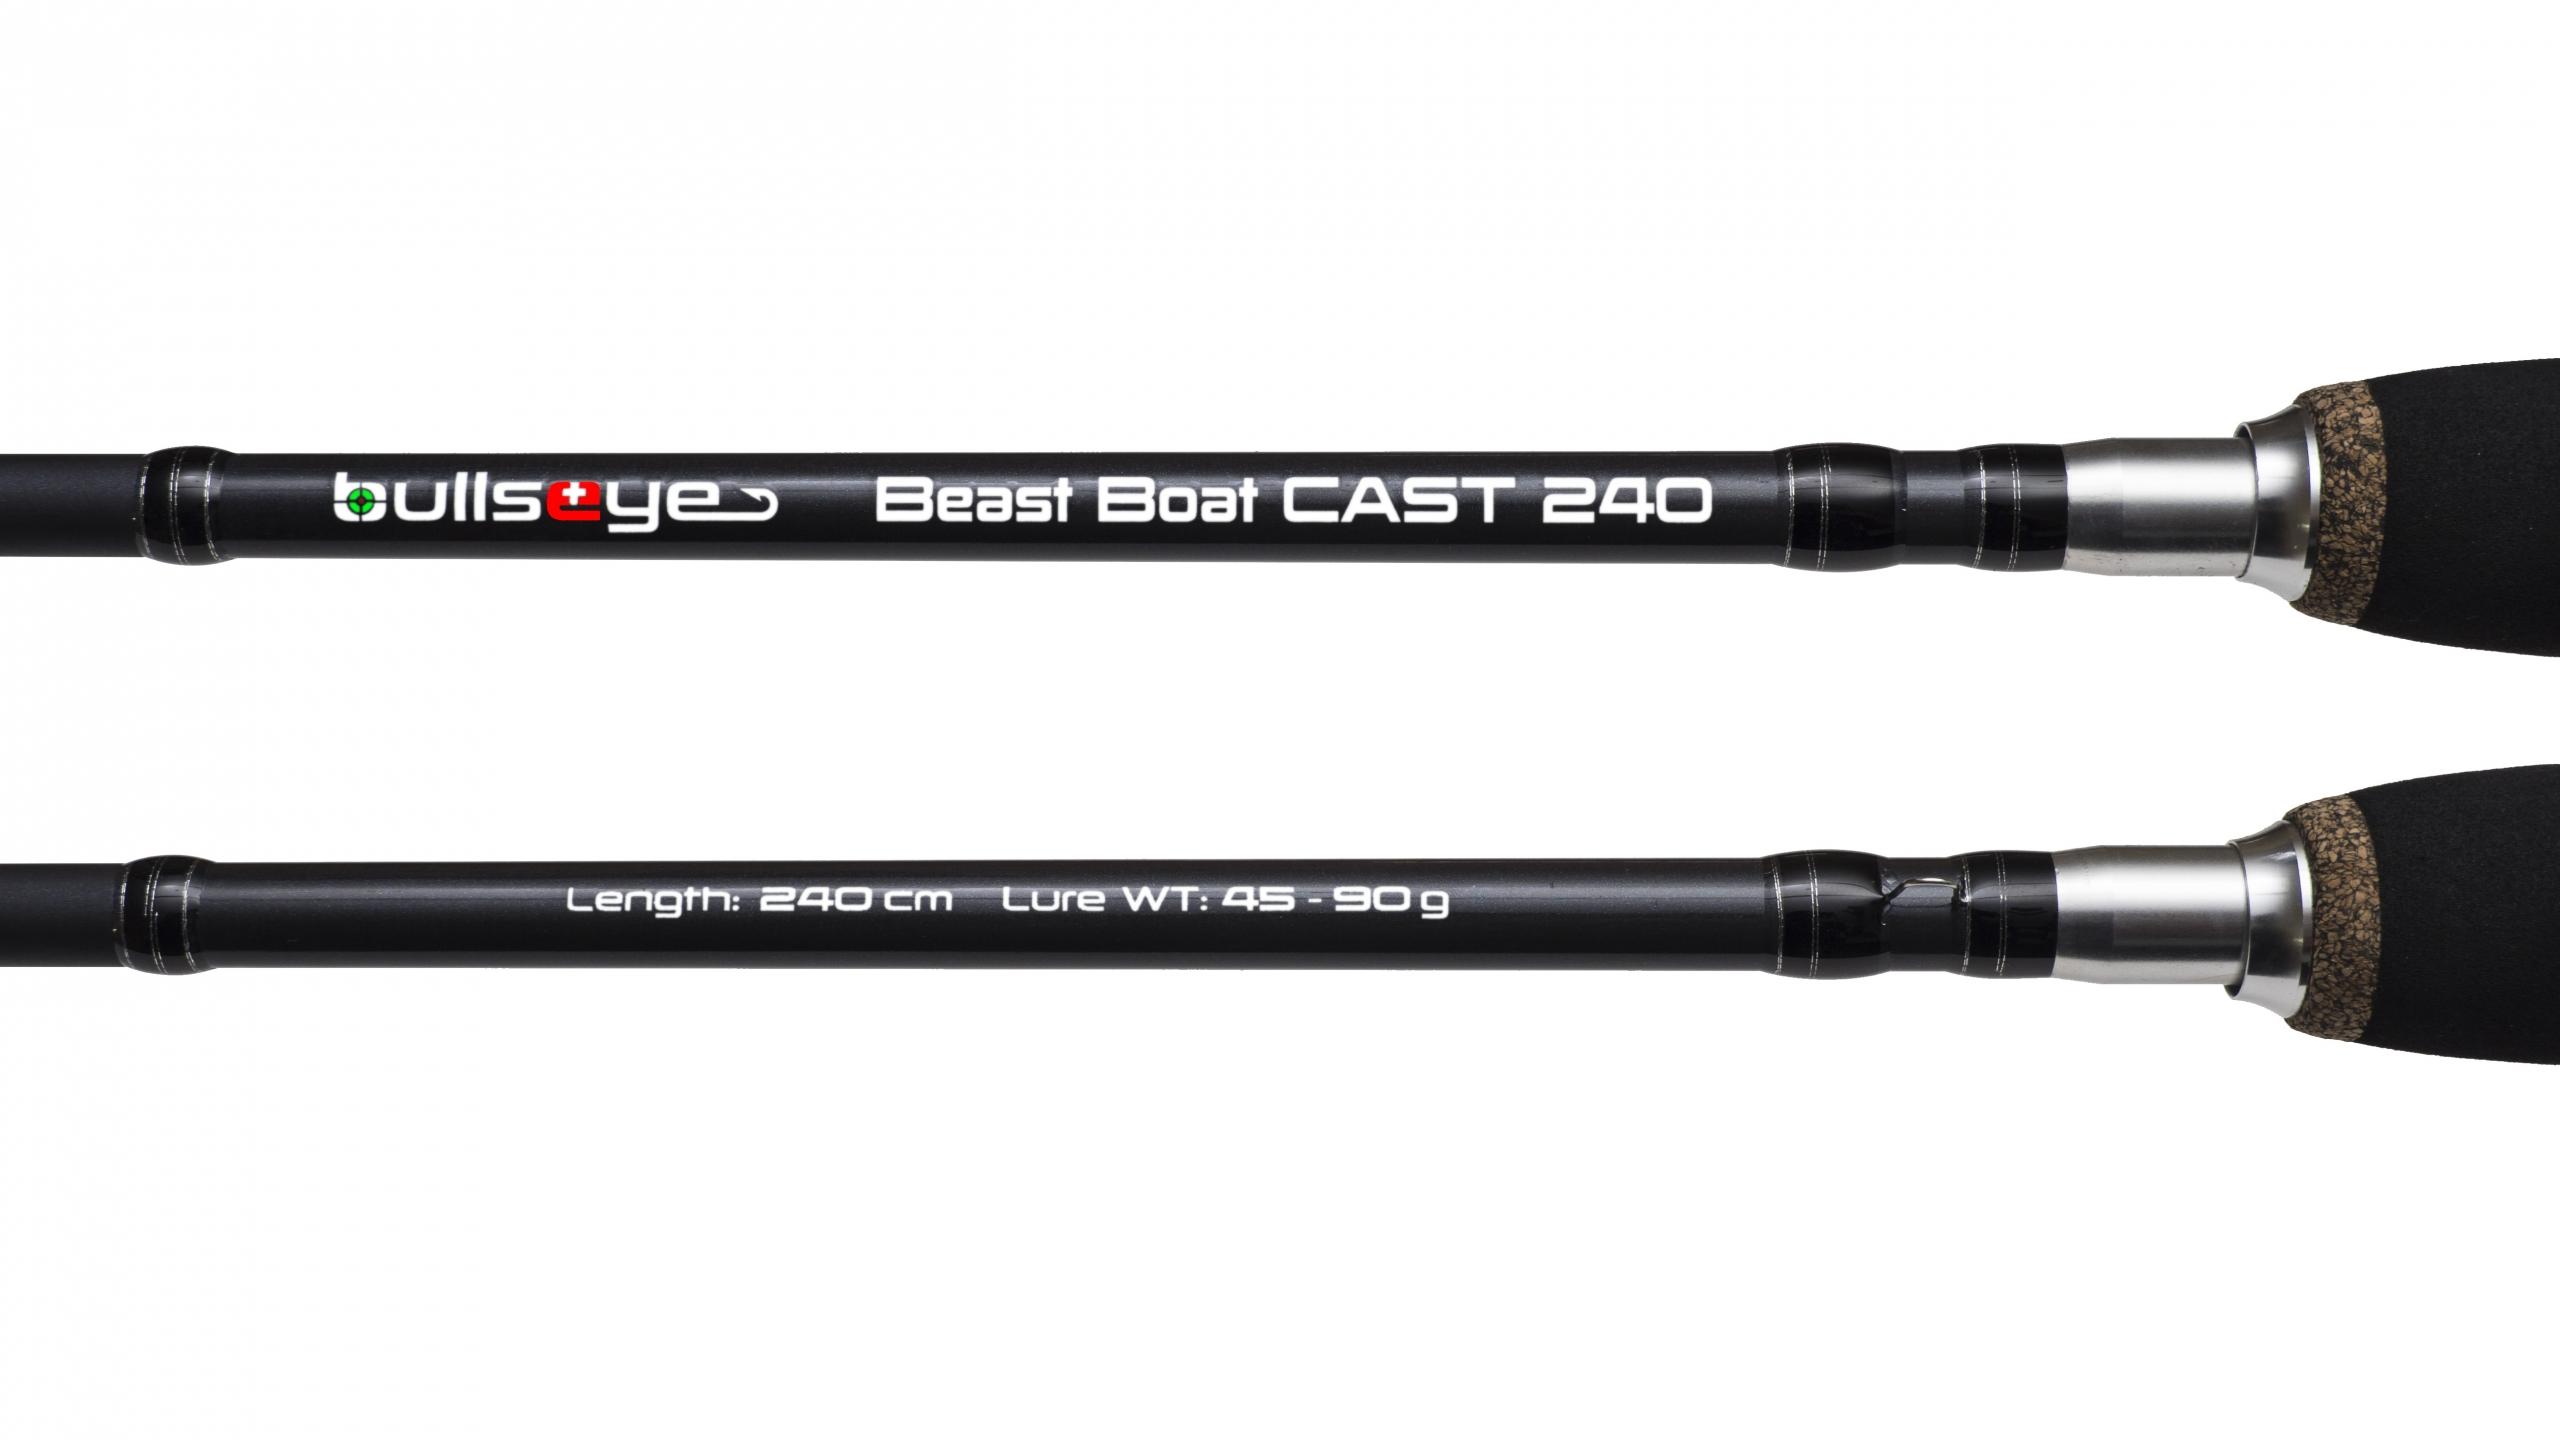 Beast Boat CAST 240 45-90g